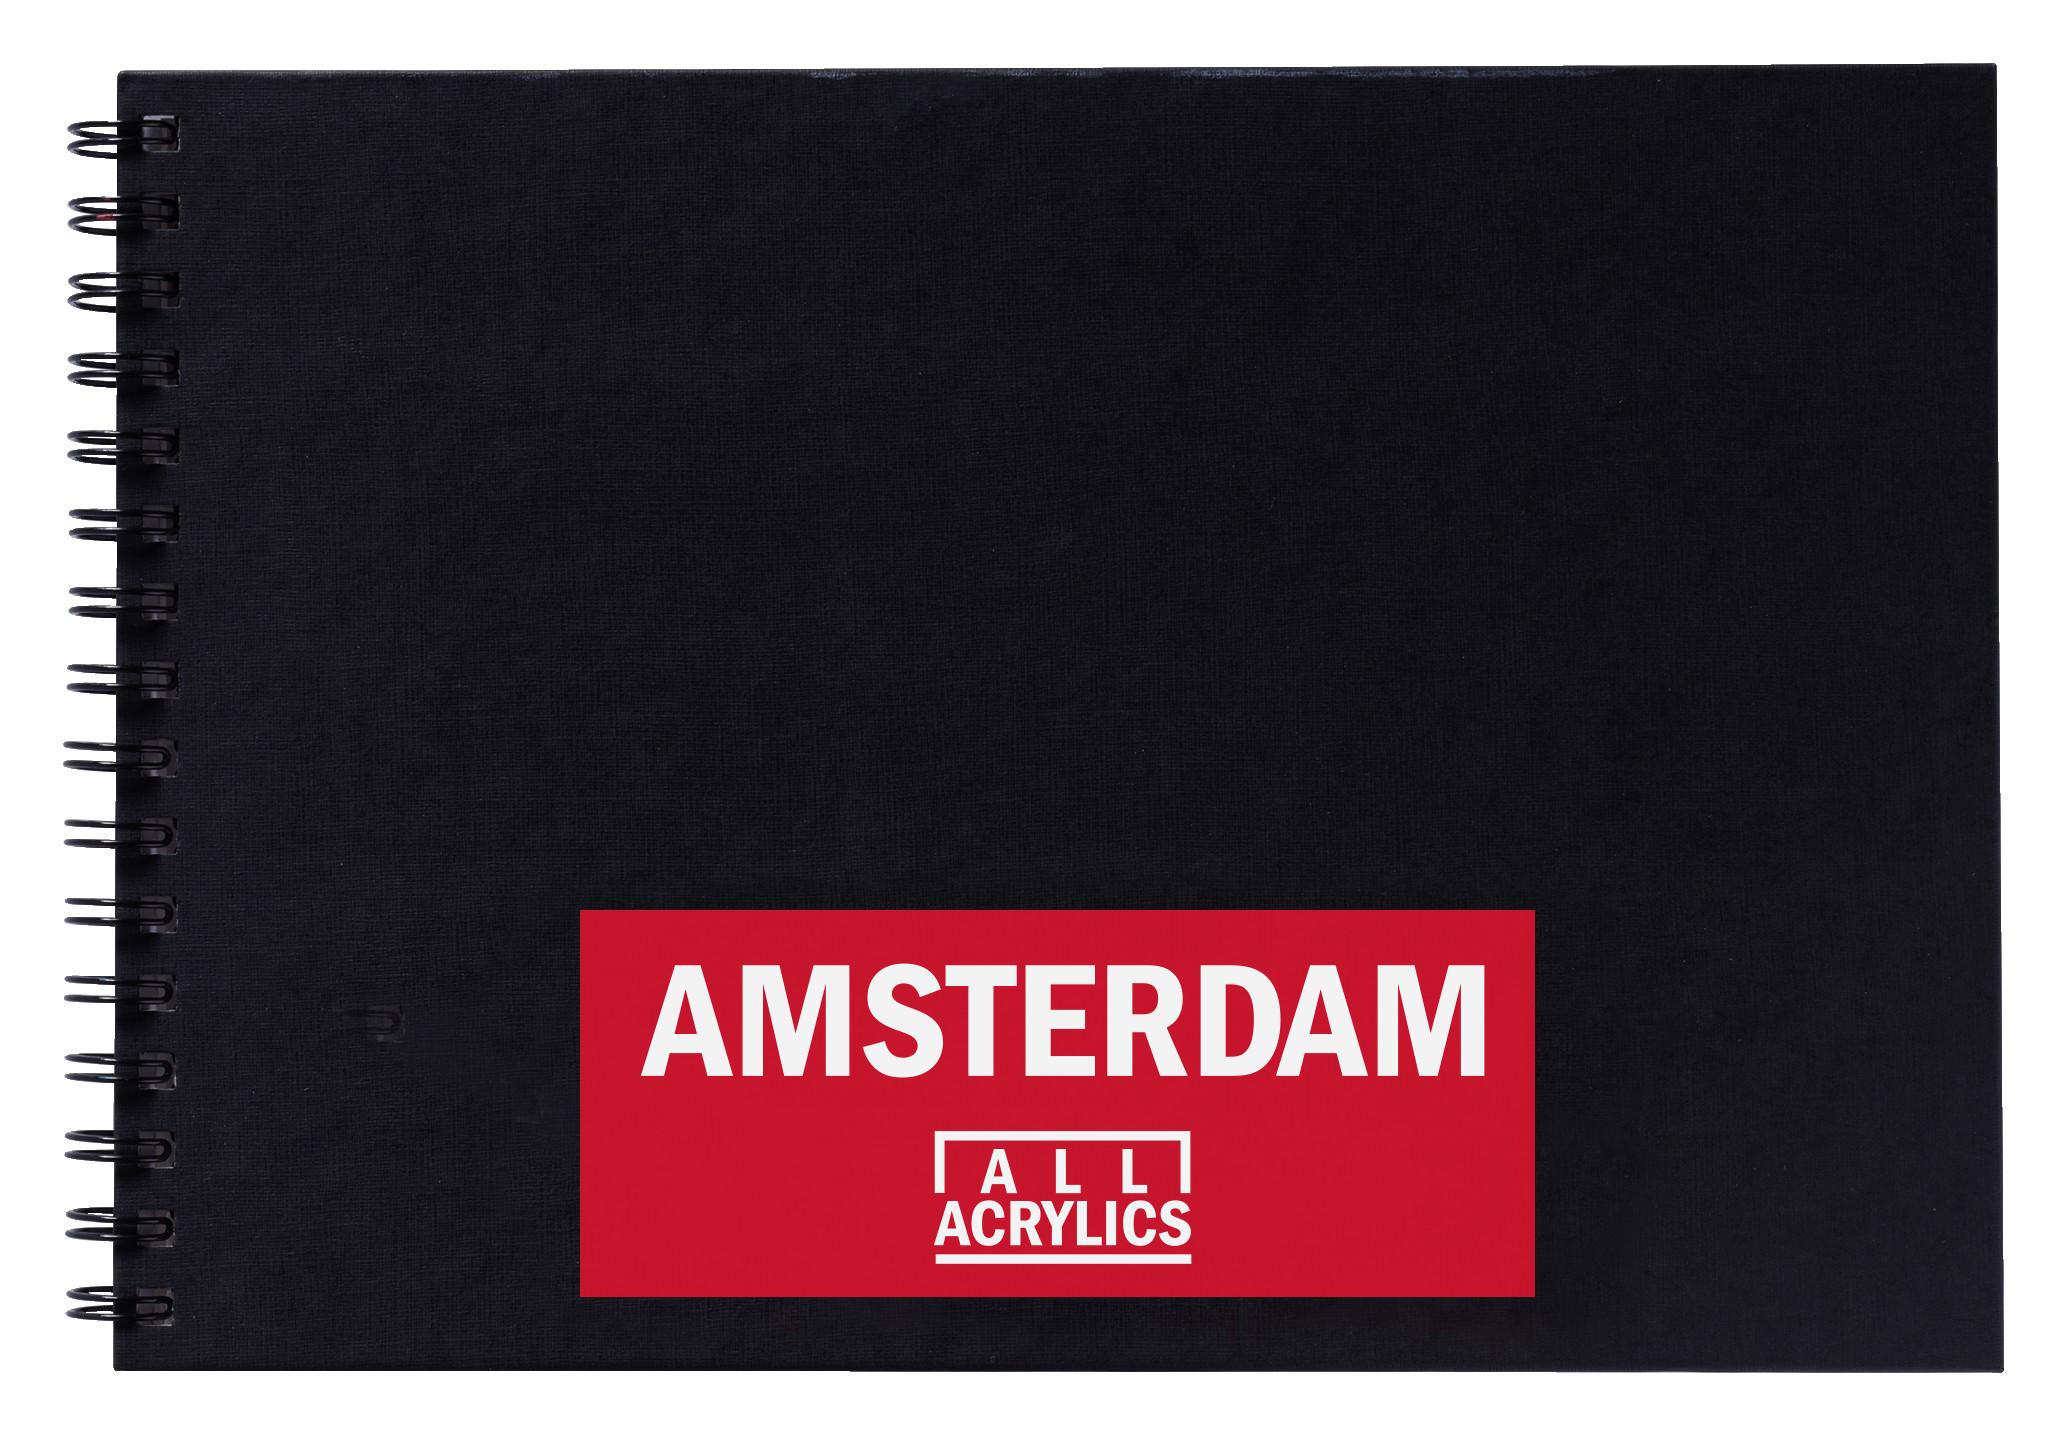 Amsterdam Black Book A4 - 29.7 x 21 cm - 250 g/m? - 30 Sheets